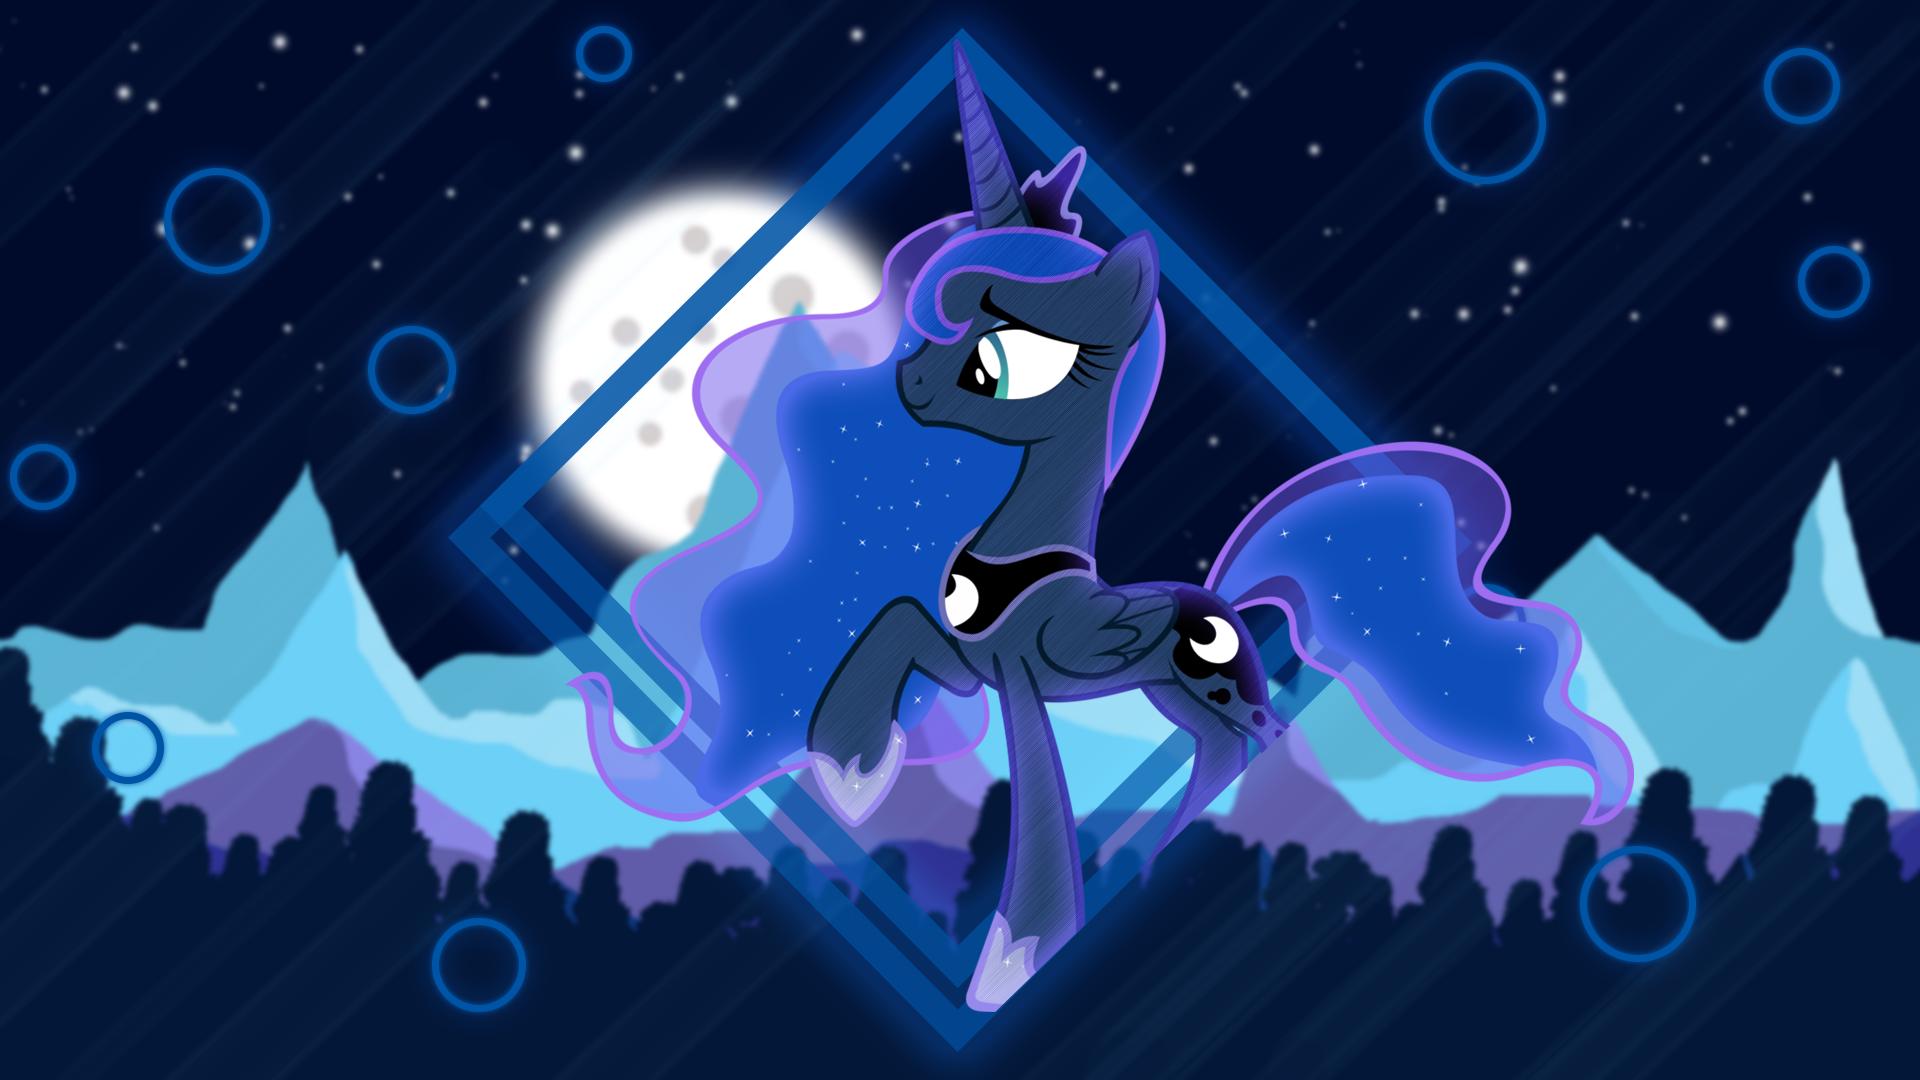 Mountains Night Princess Luna Wallpaper Princess Luna Princess Twilight Sparkle Wallpaper